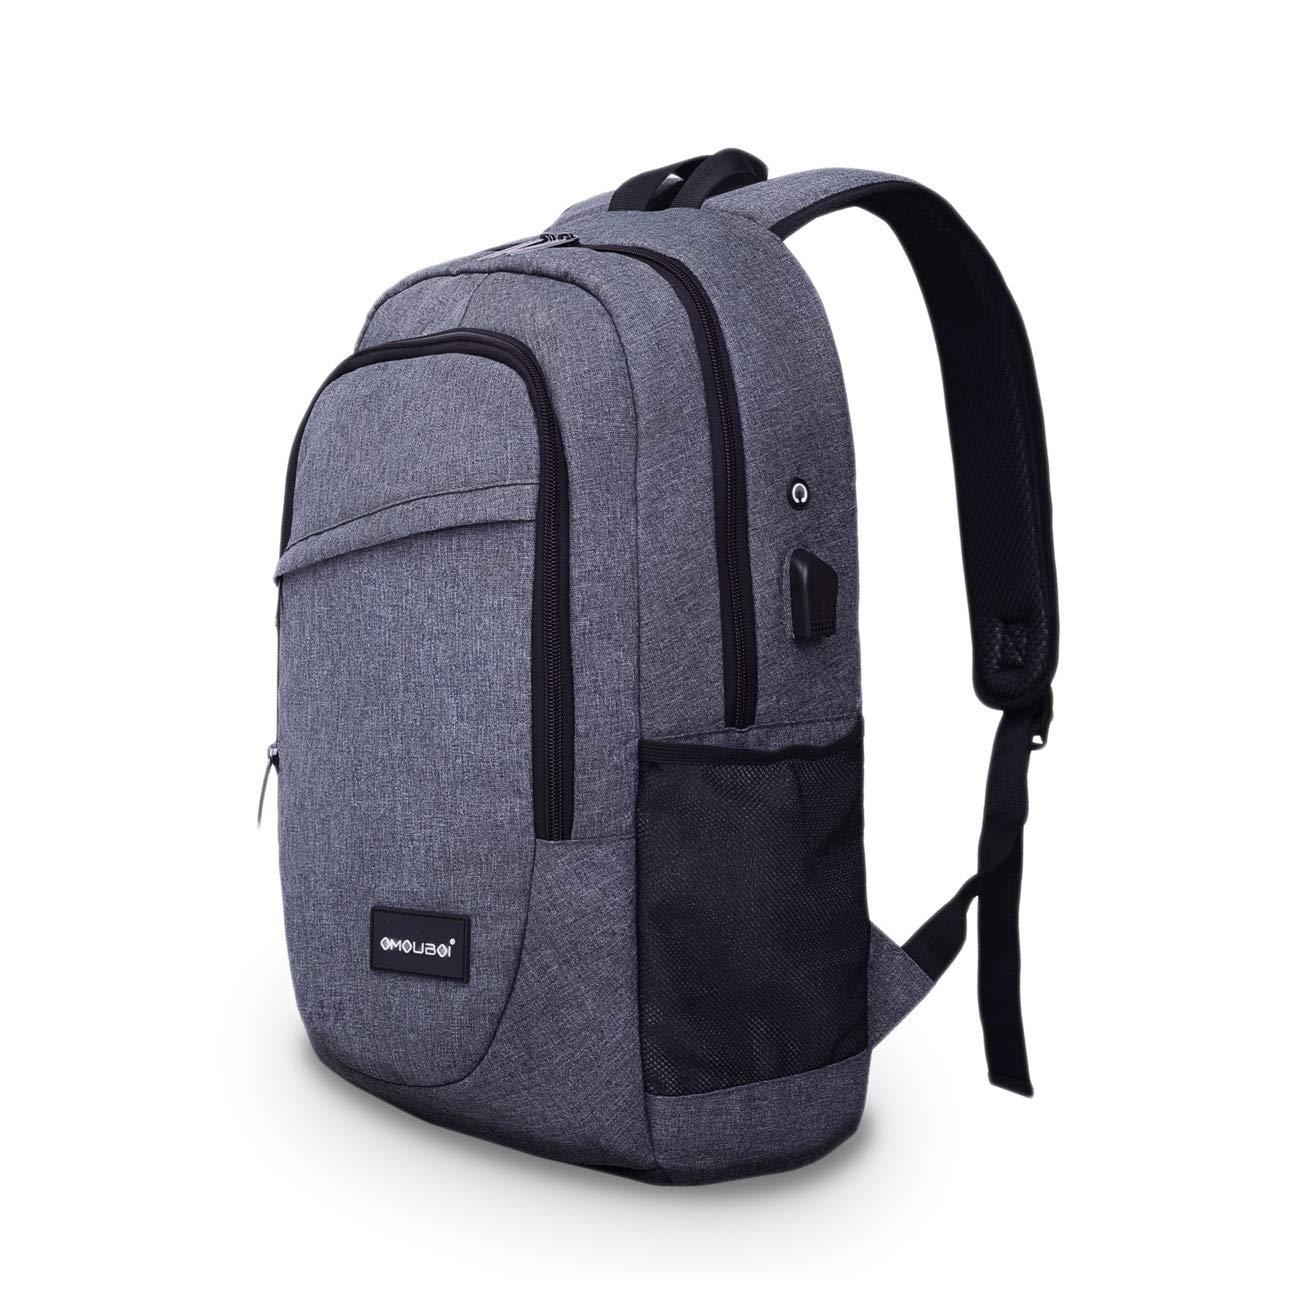 Laptop Backpack OMOUBOI Travel Computer Backpack